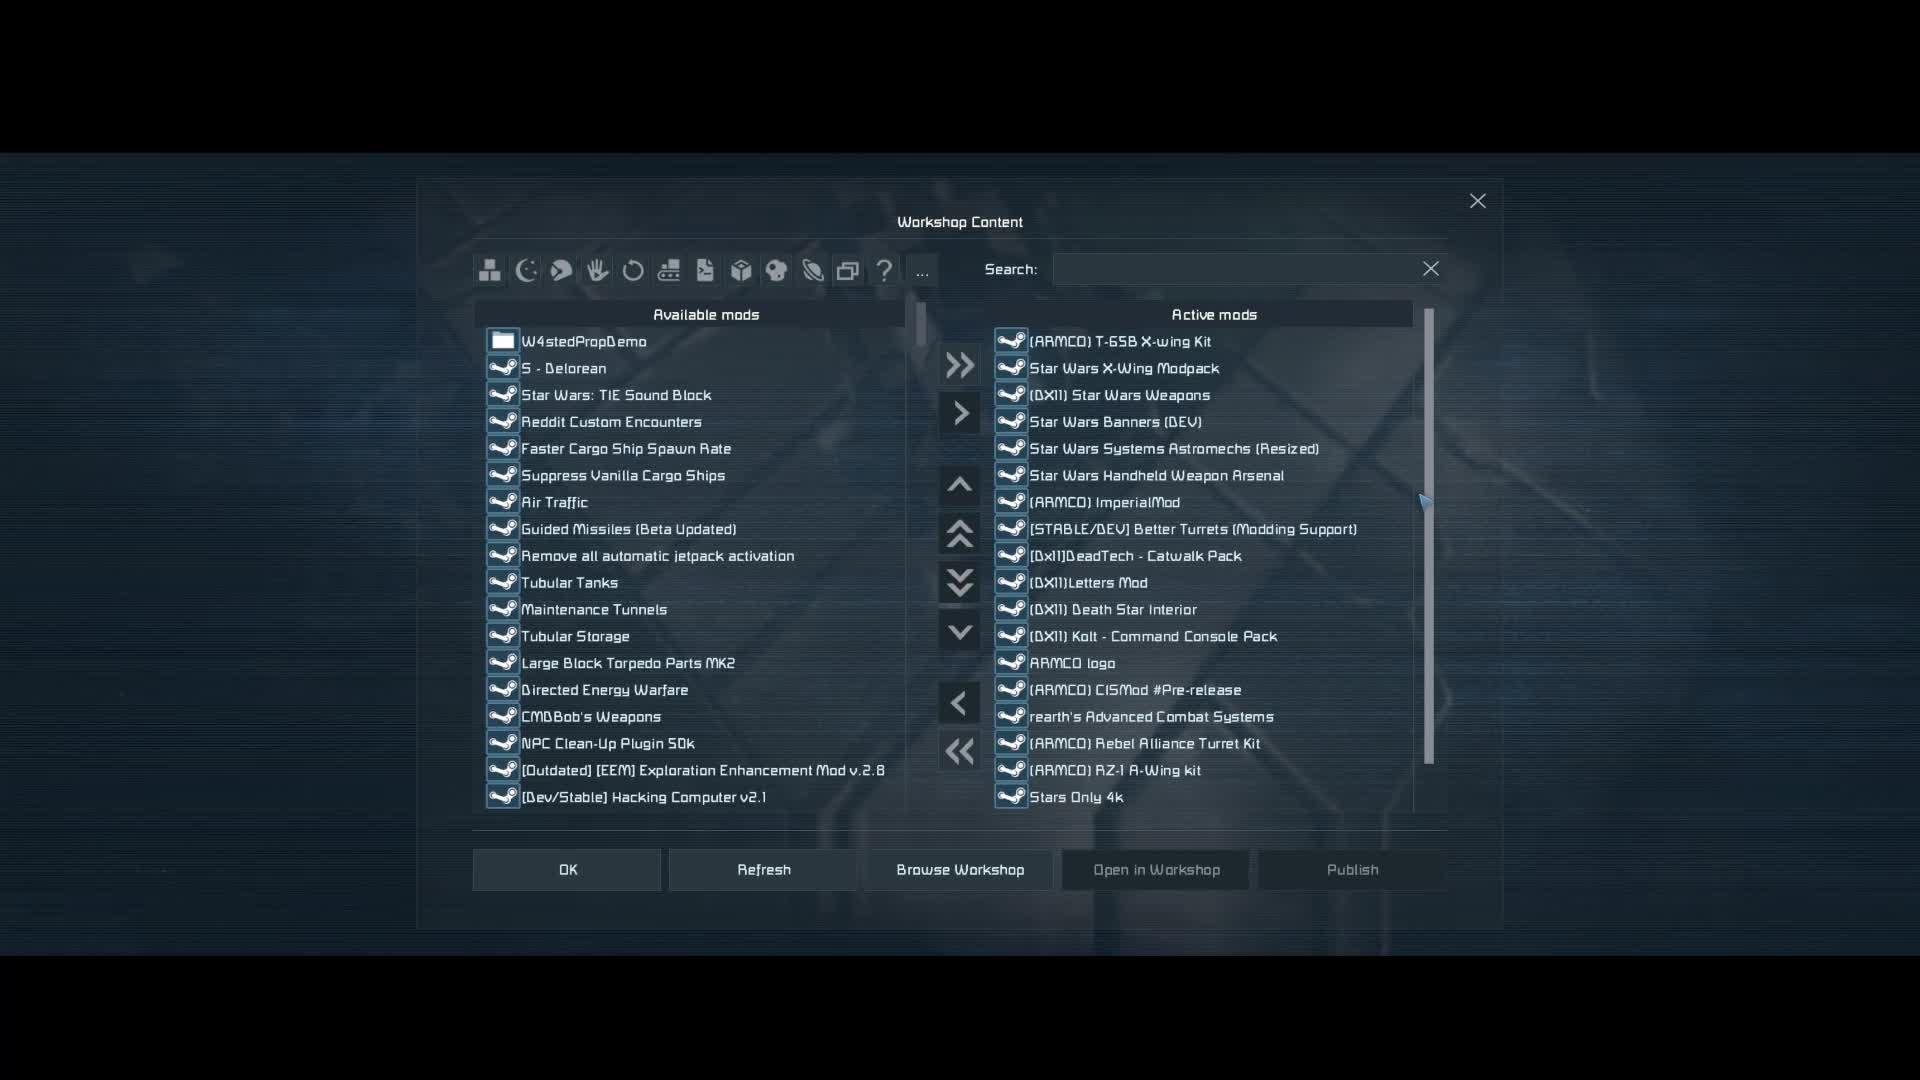 CaptainShack - Space Engineers - Interdictor-class Star